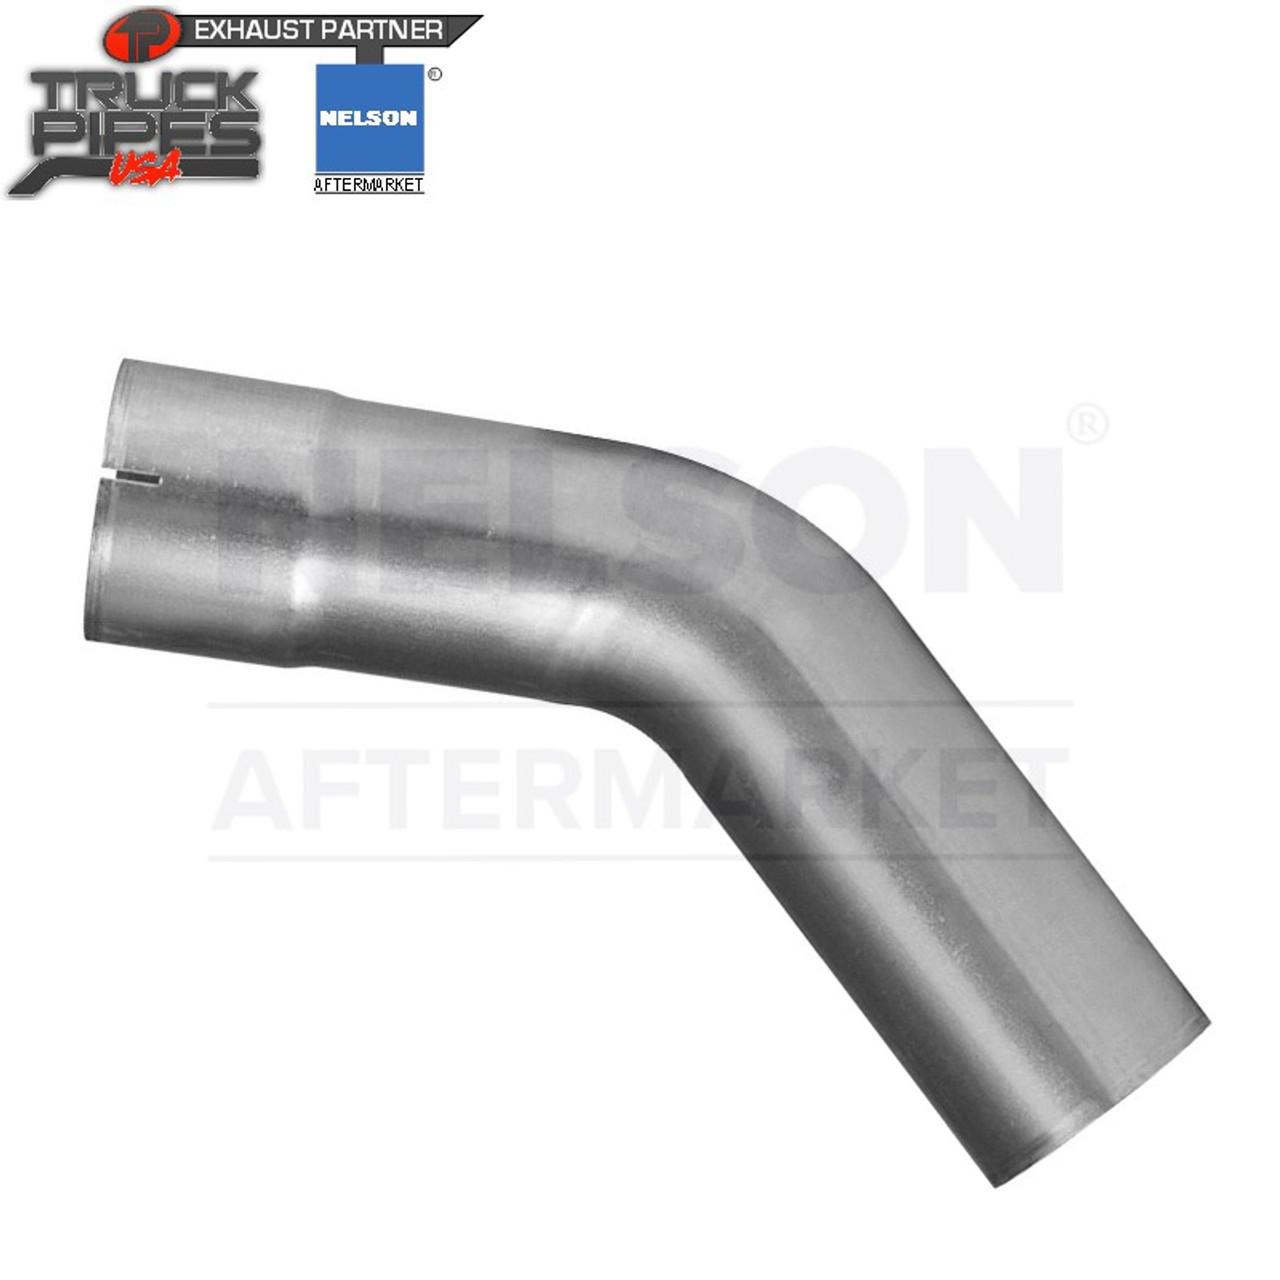 "6"" OD-ID 45 Degree Exhaust Elbow Aluminized x 8"" Leg Length Nelson 900066A"